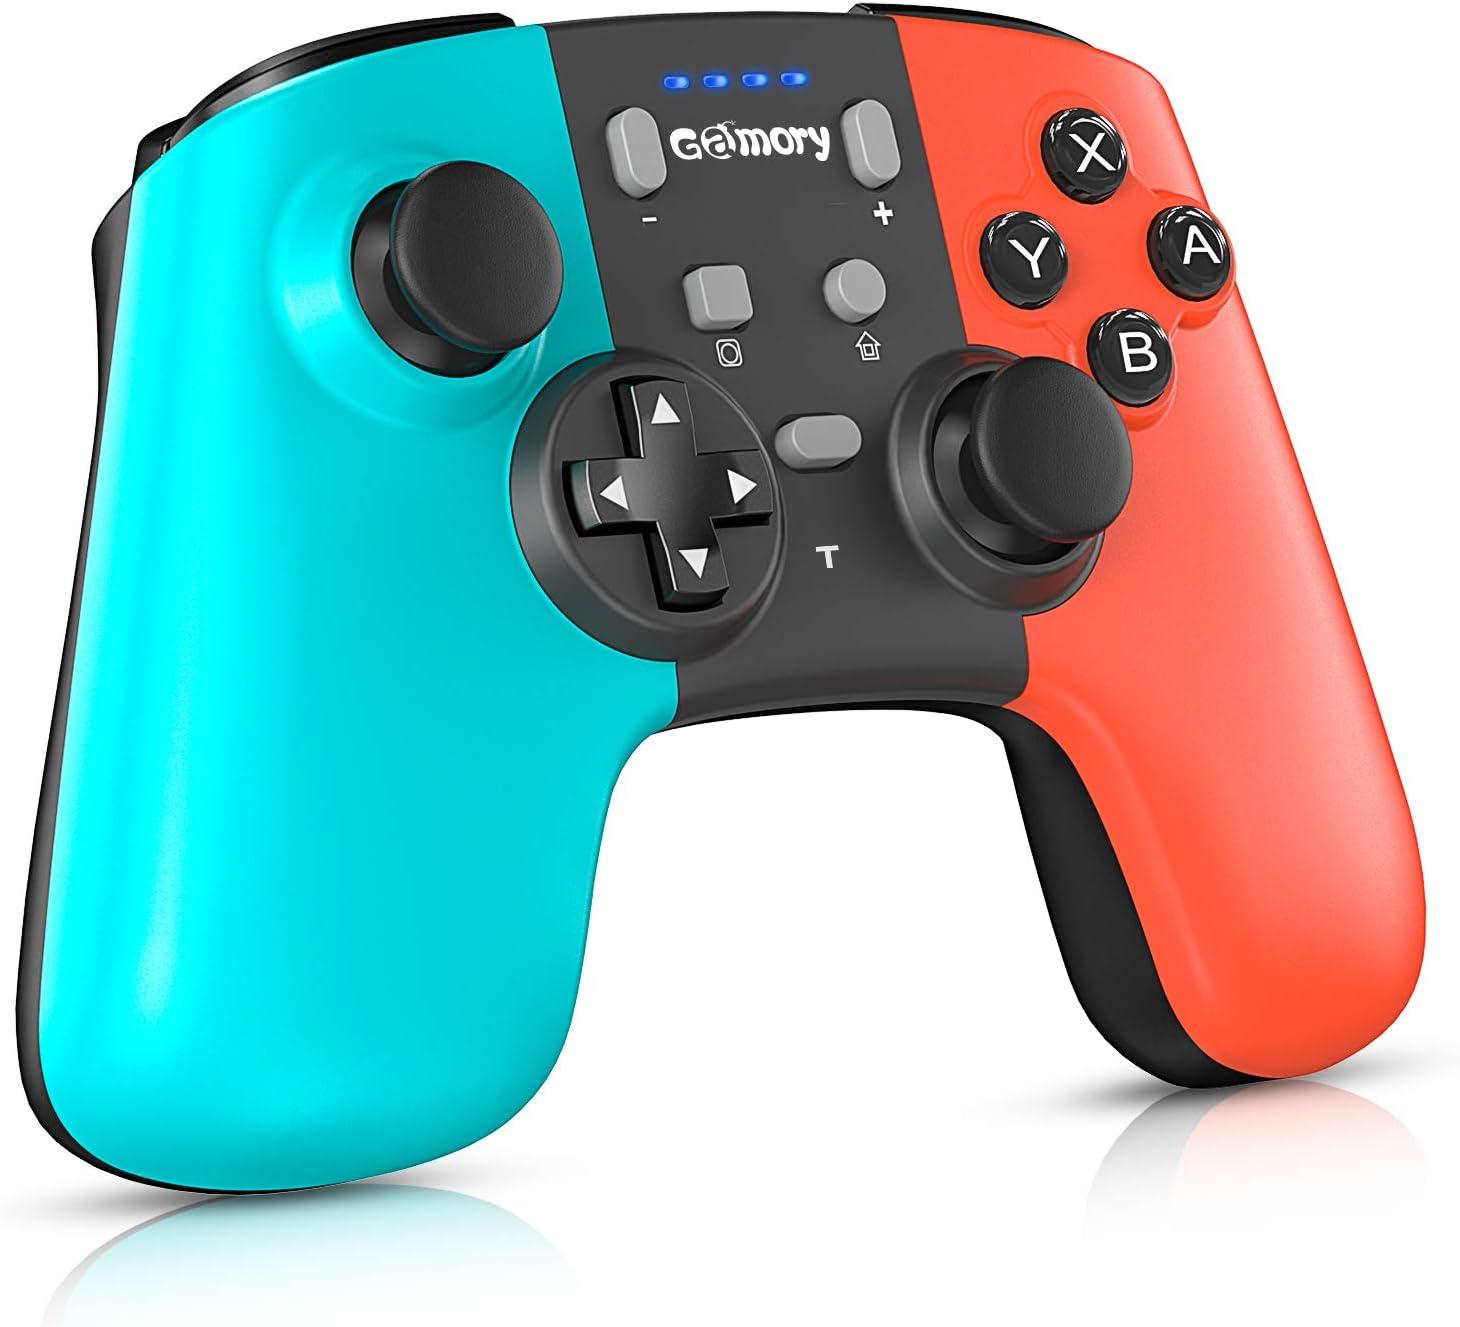 Gamory Mando para Nintendo Switch,Mando Pro Controller Mando pc Inalambrico,Bluetooth Inalámbricos pro Nintendo Switch Gamepad controlador con Turbo Dual Shock Gyro Axi ajustable